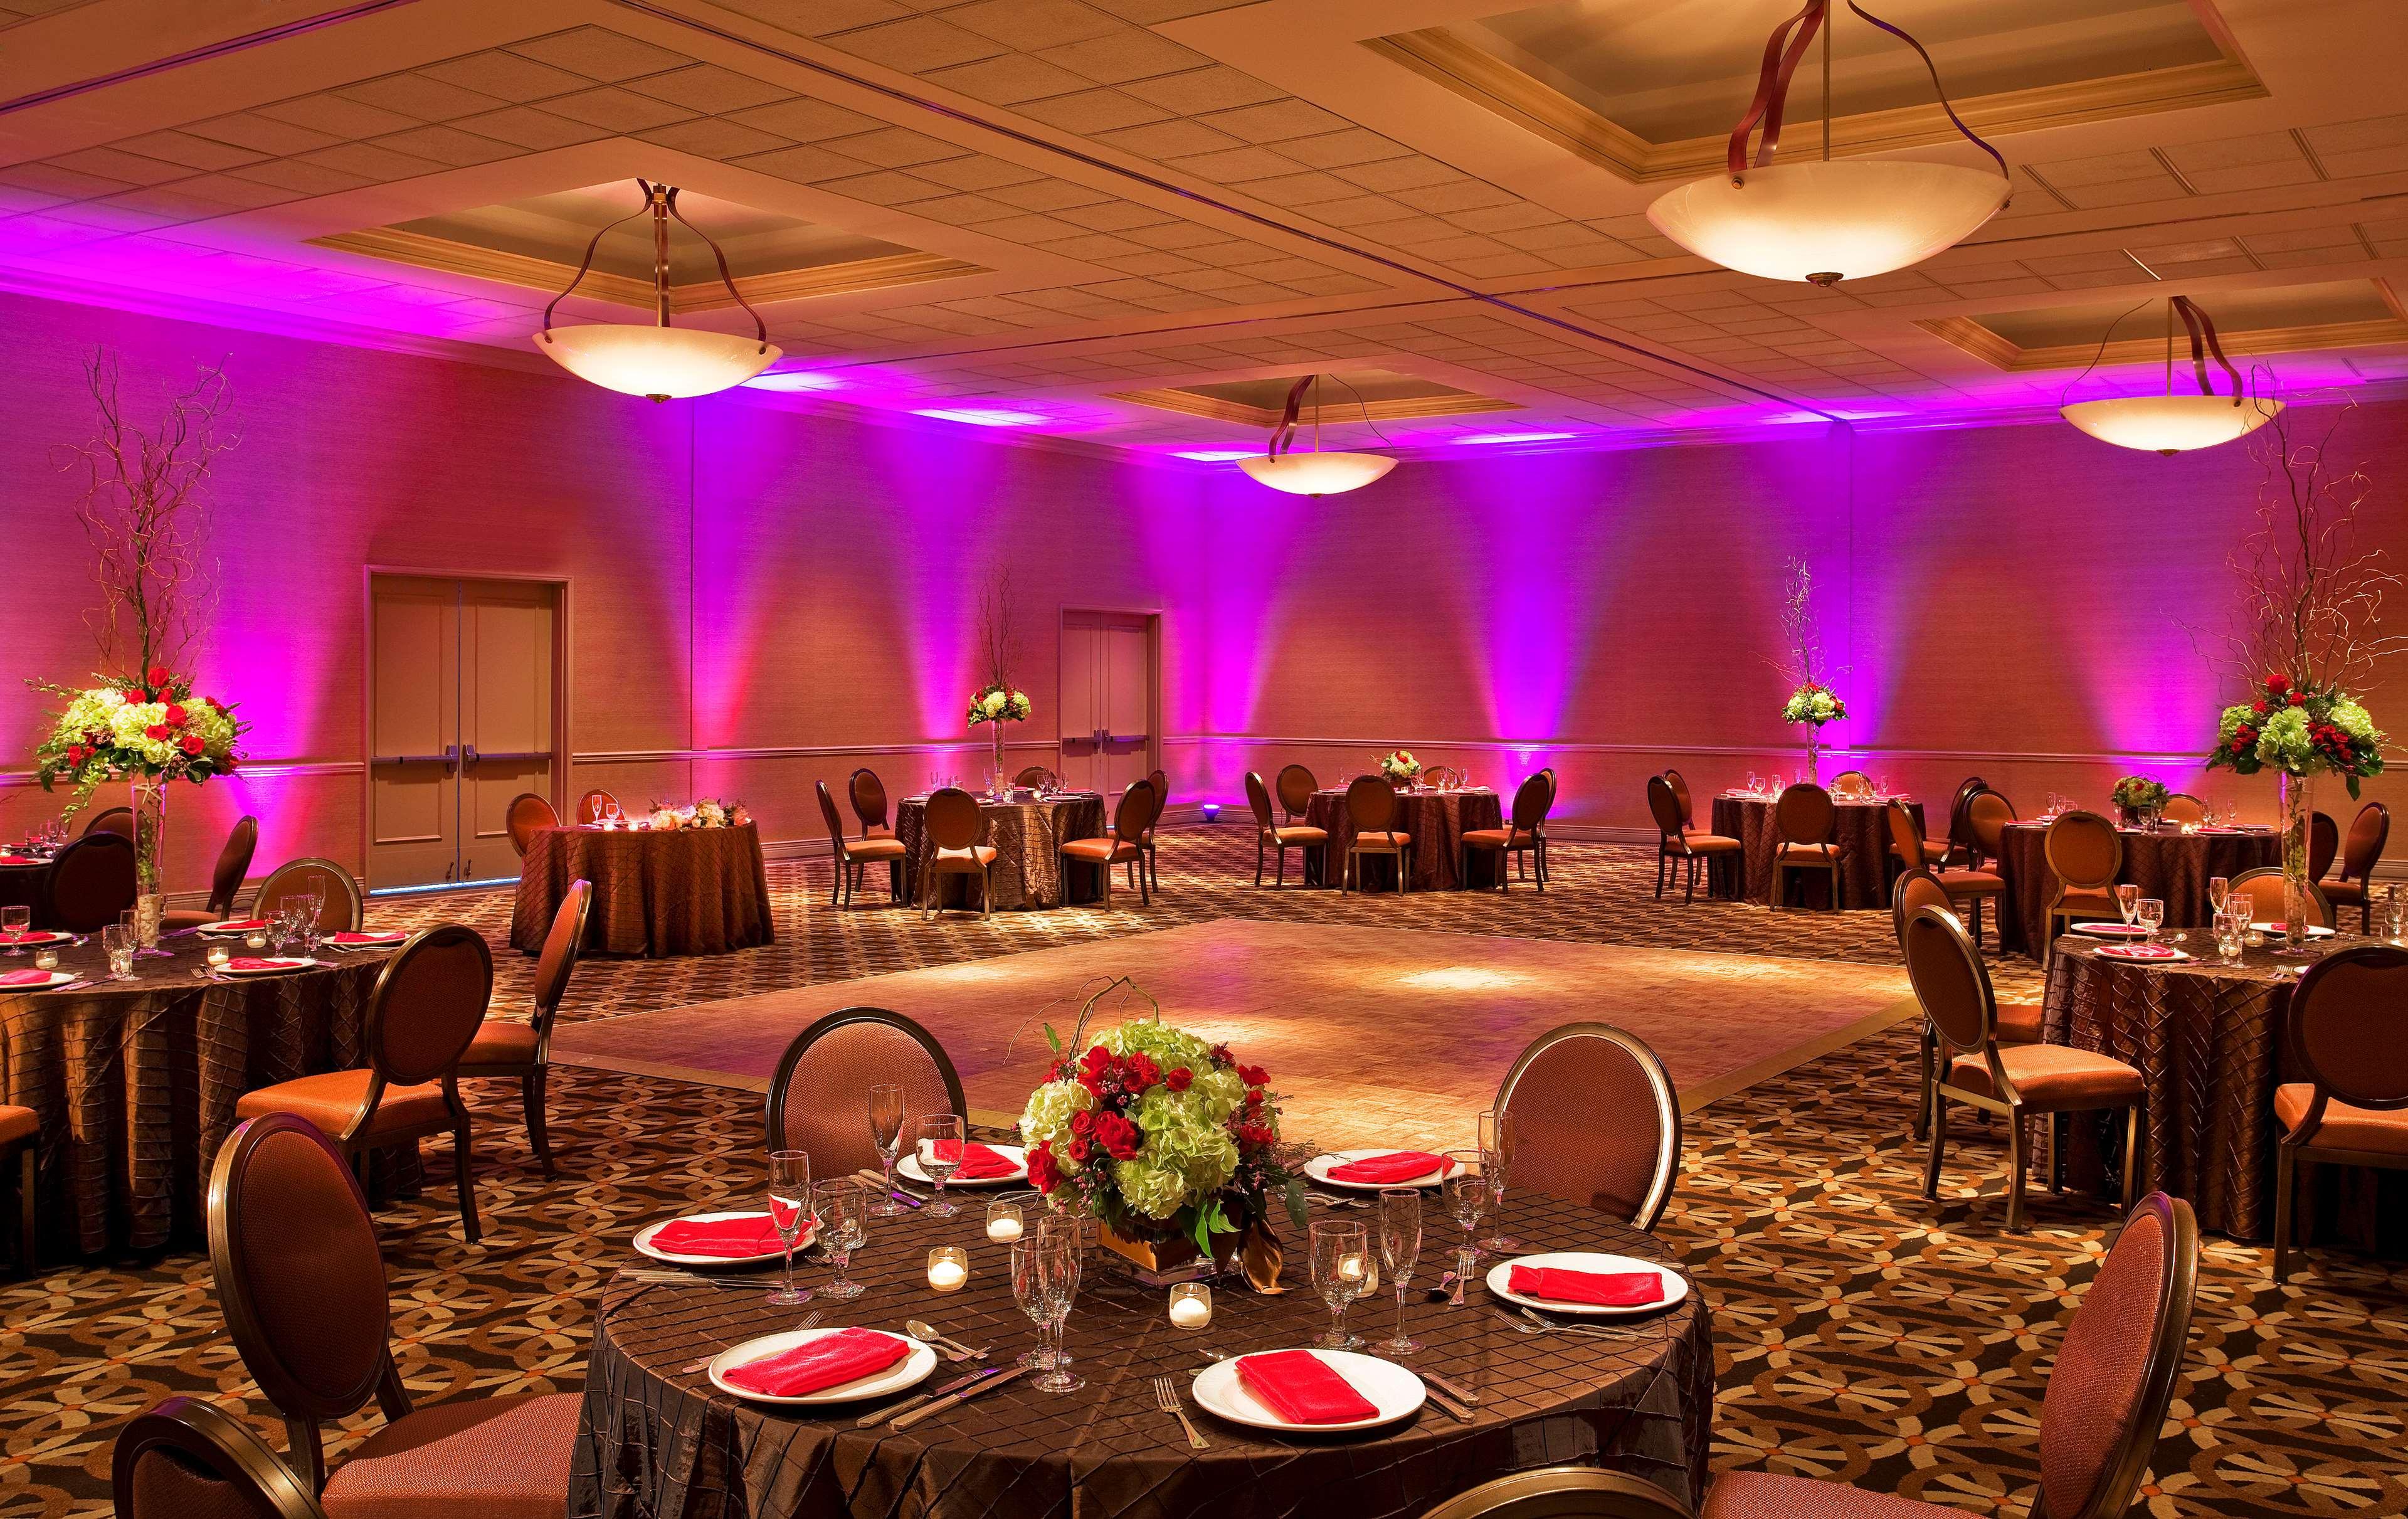 Sheraton Atlantic City Convention Center Hotel image 18